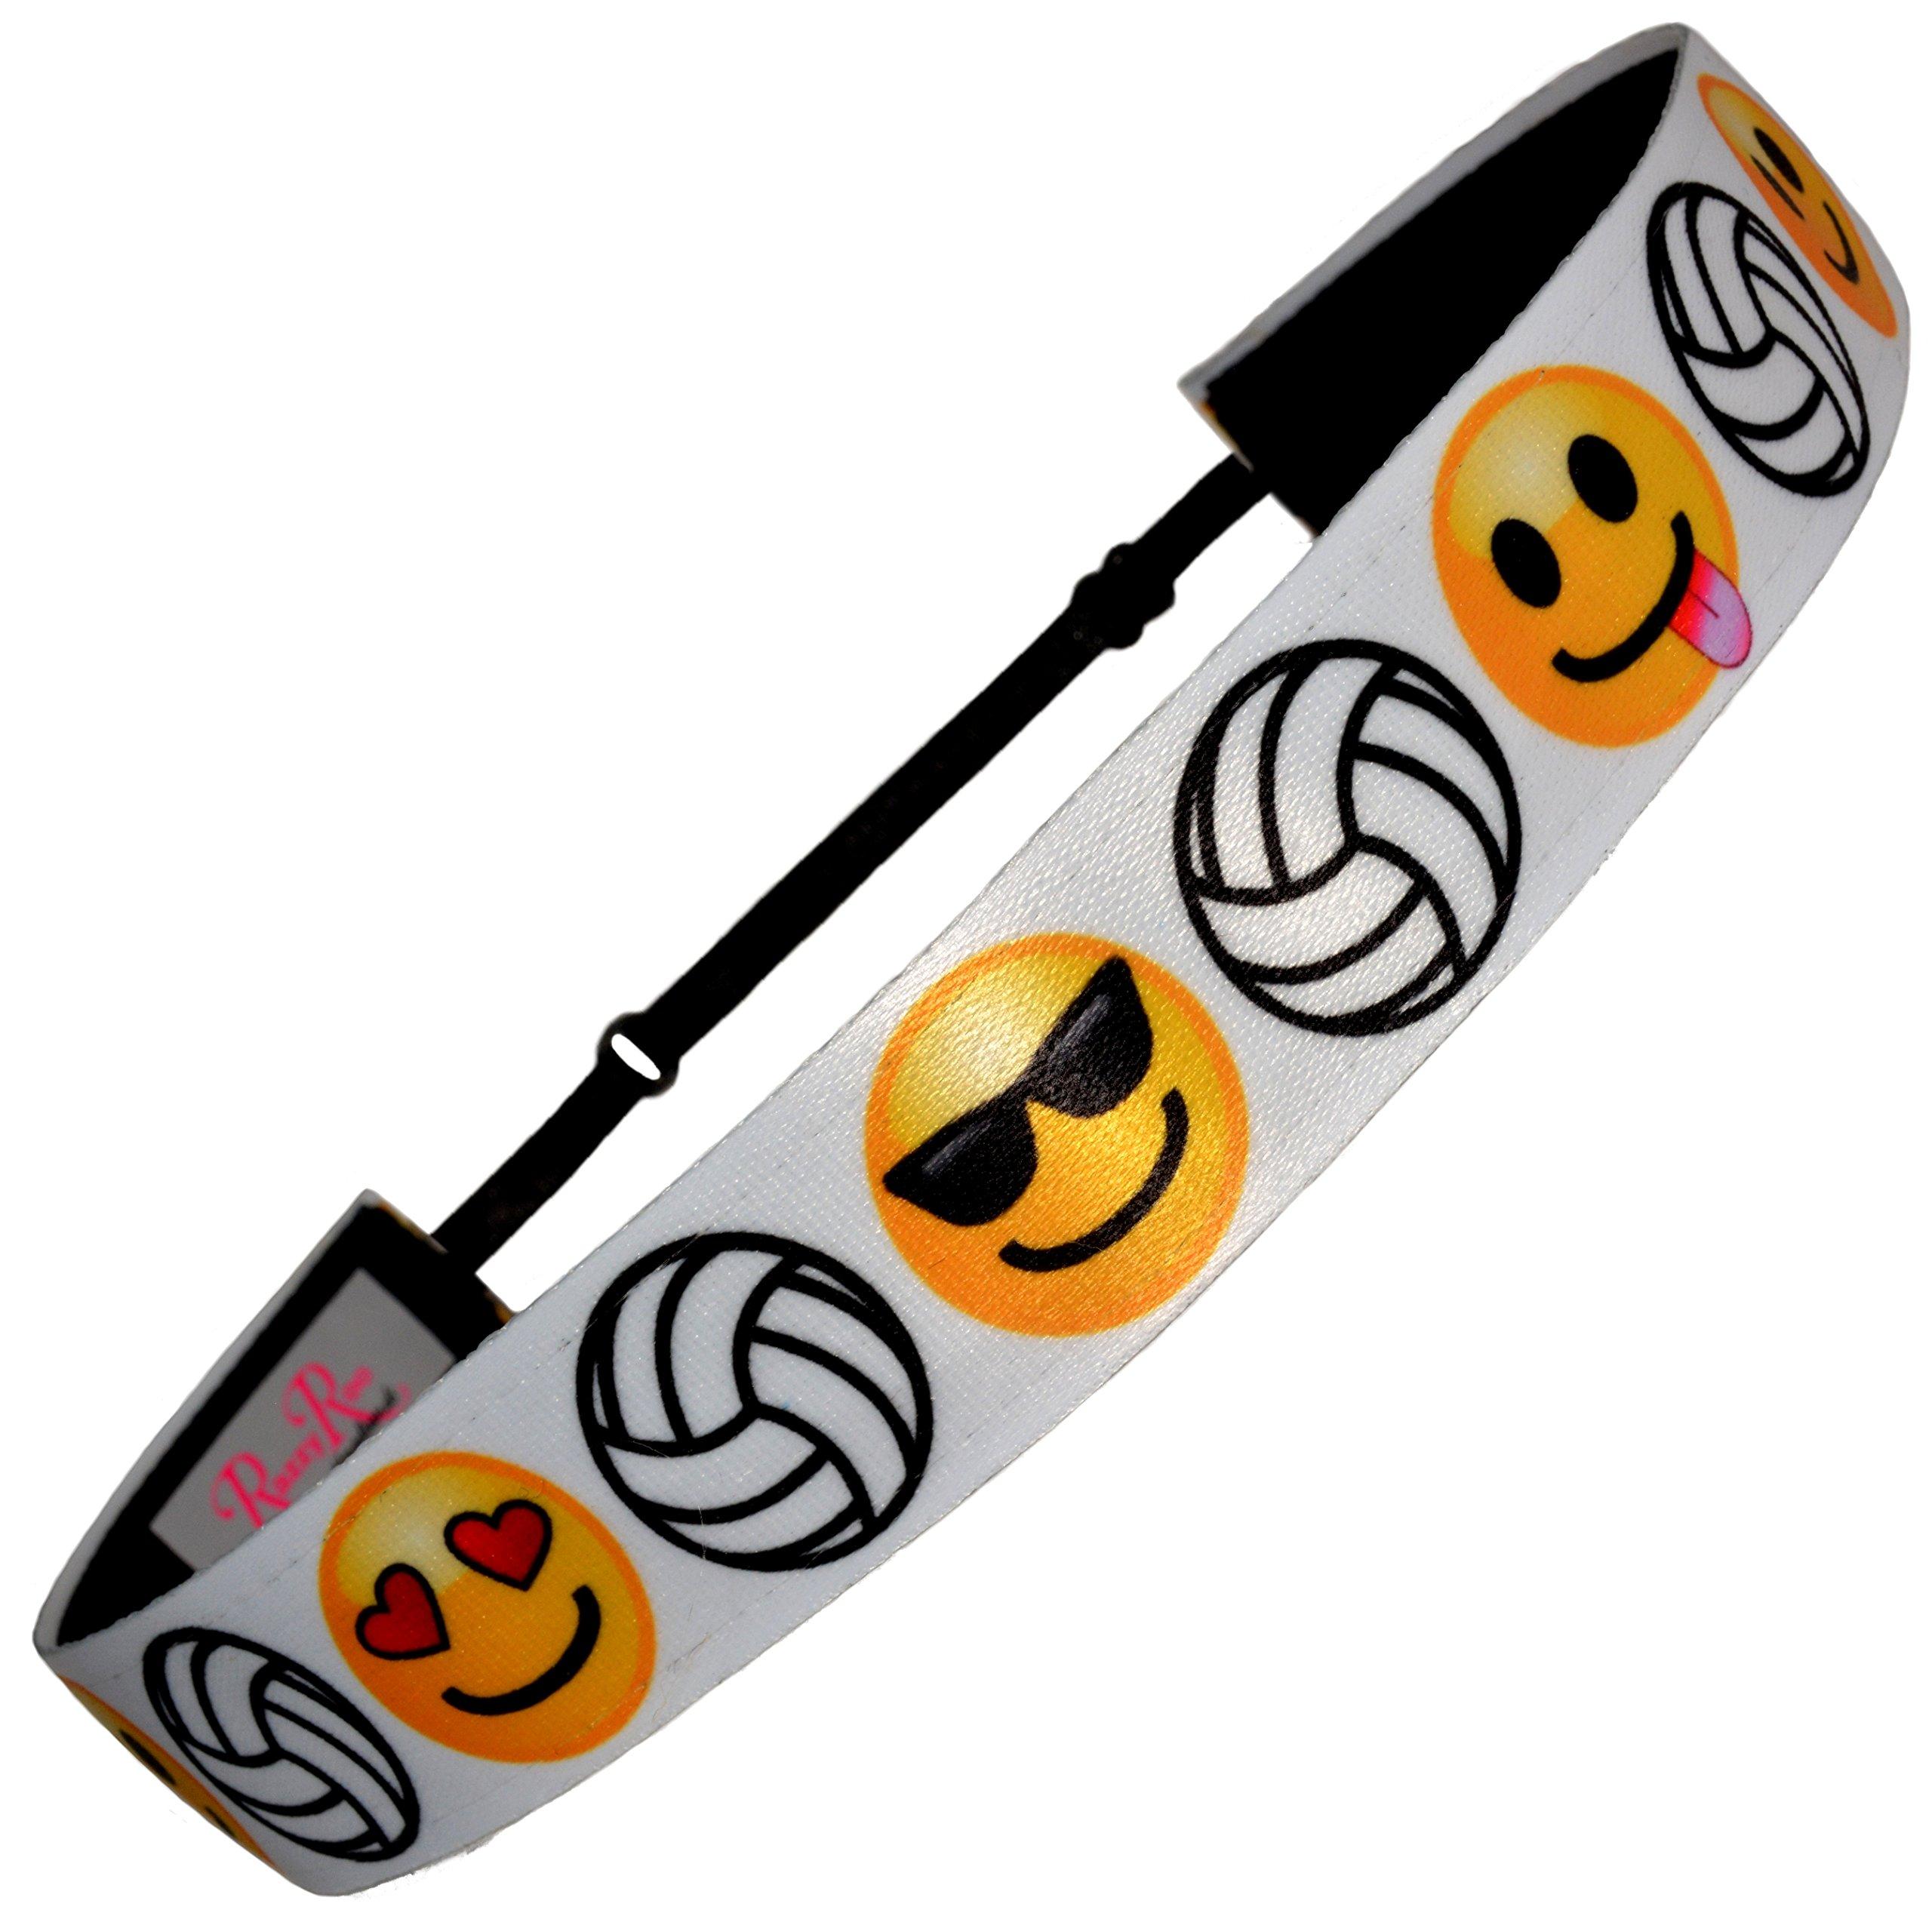 Non Slip Adjustable Headband ''Emoji Volleyball'' Smiley Faces Girls Volleyball Headband by RazzyRoo Headbands by RazzyRoo Headbands (Image #1)